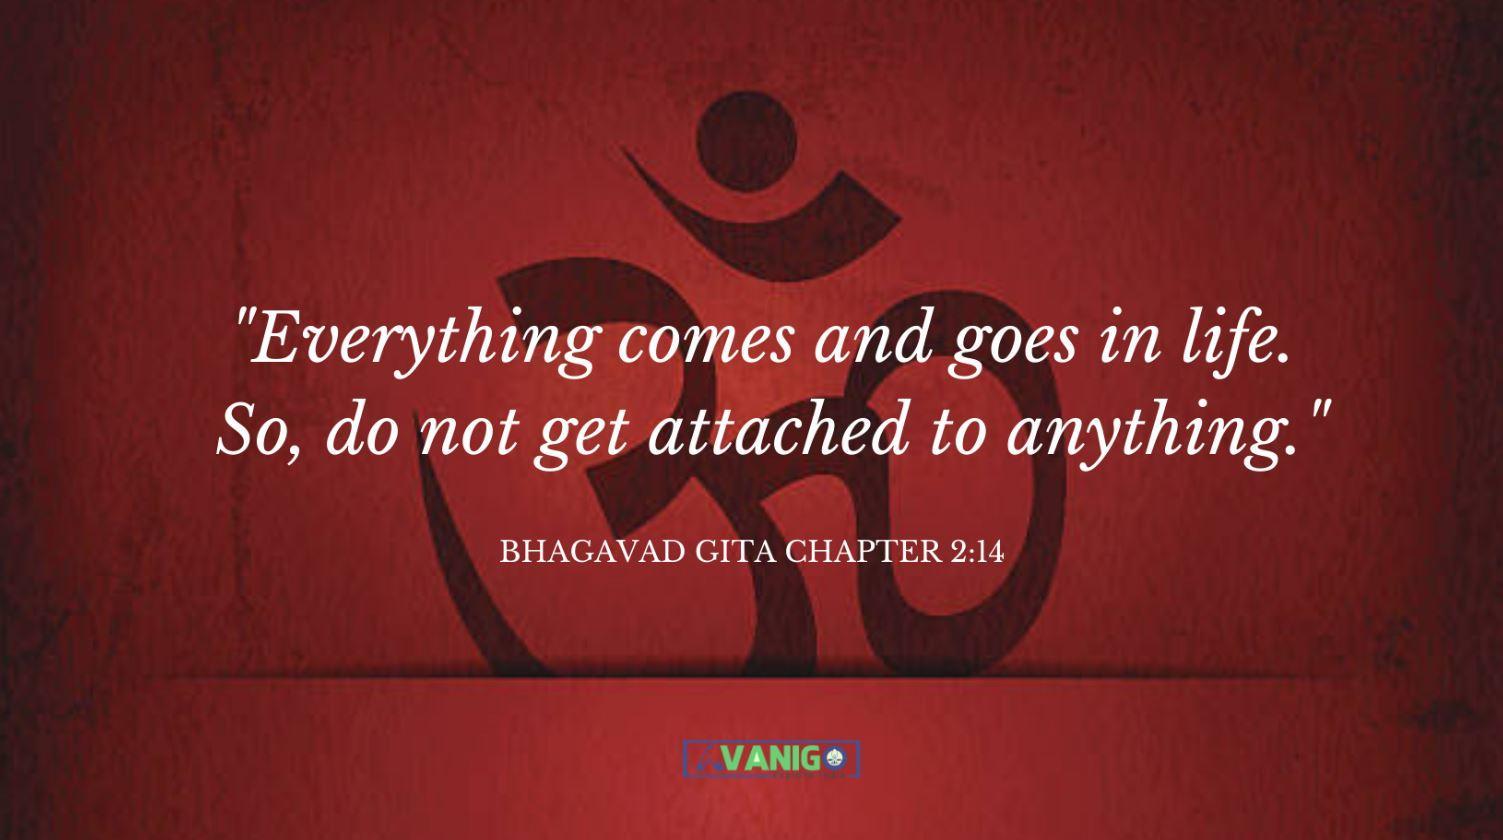 Bhagvad Gita Chapter 2:14